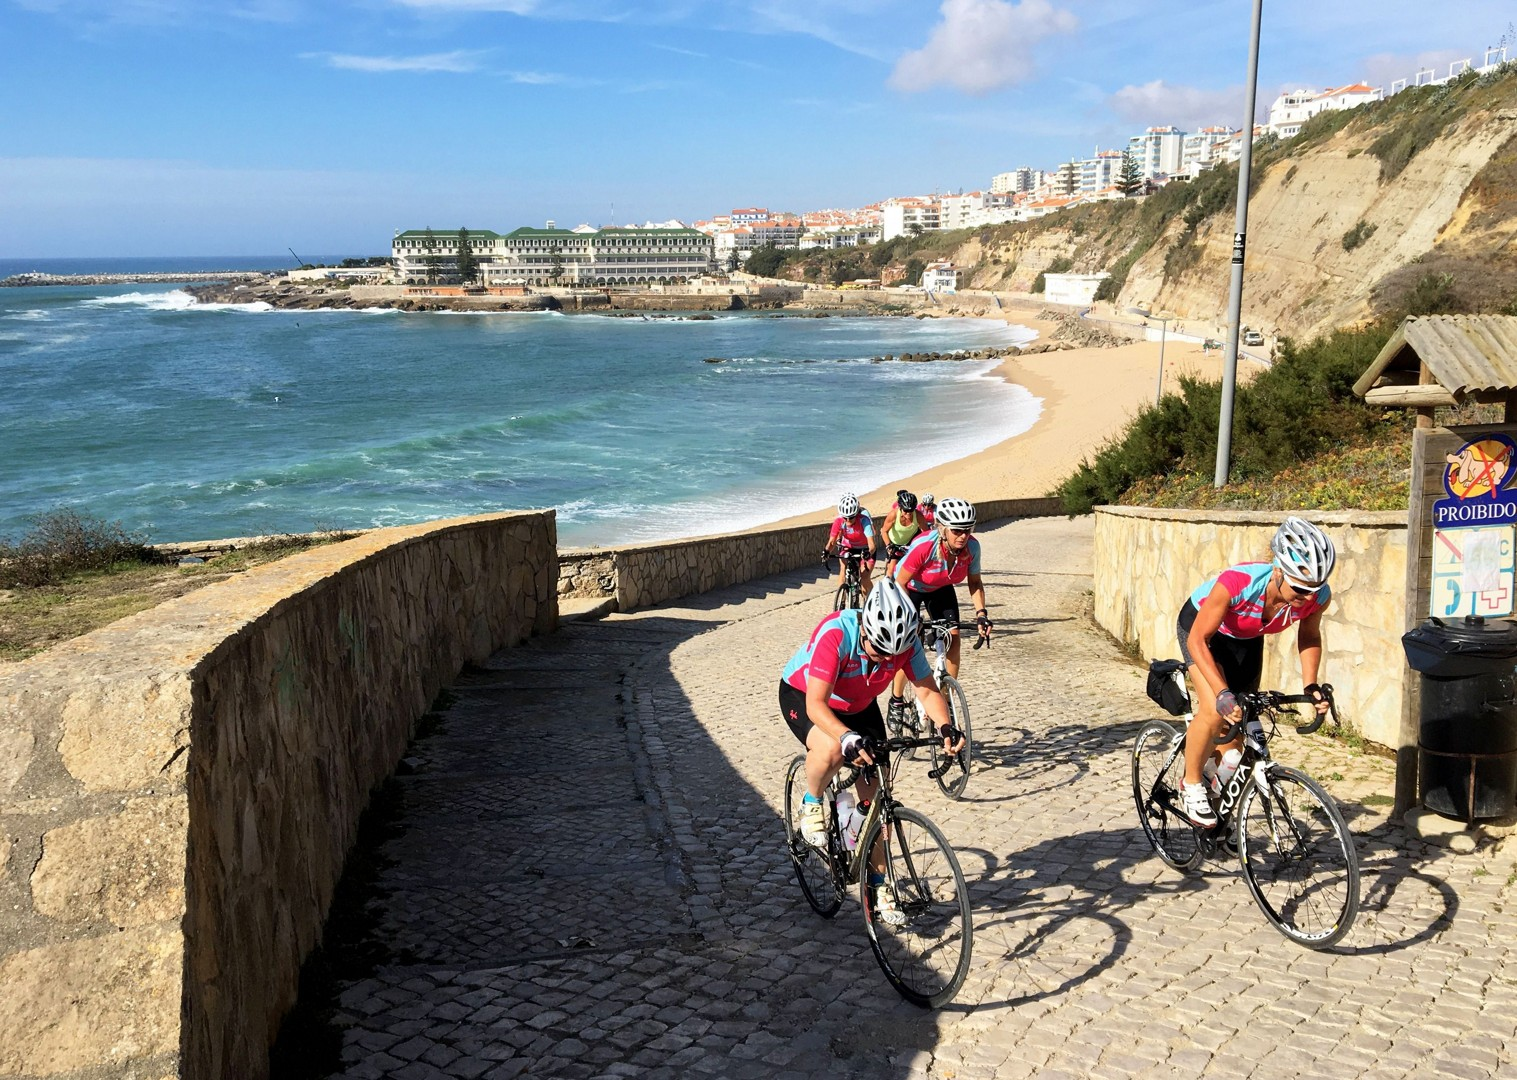 coastal-views-portugal-atlantic-escape.jpg - Portugal - Atlantic Escape - Guided Road Cycling Holiday - Road Cycling